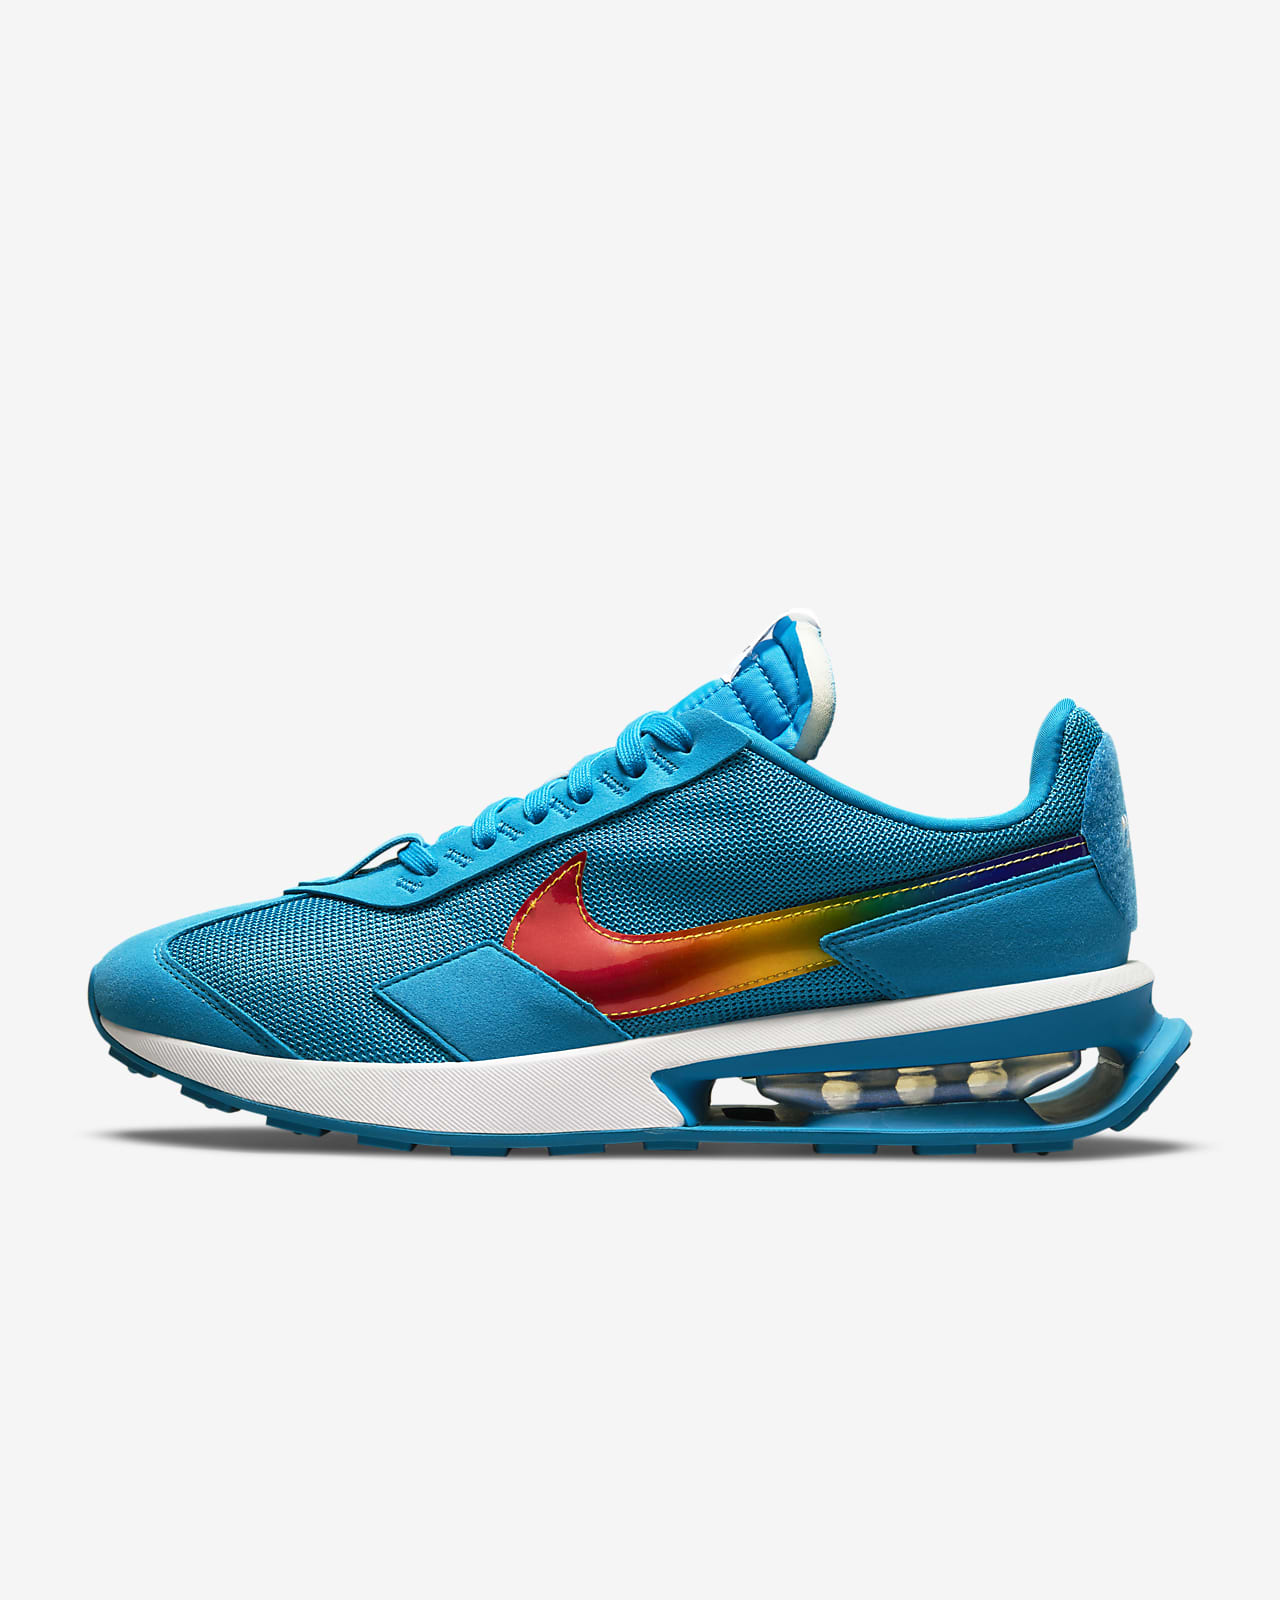 Calzado Nike Air Max Pre-Day Be True